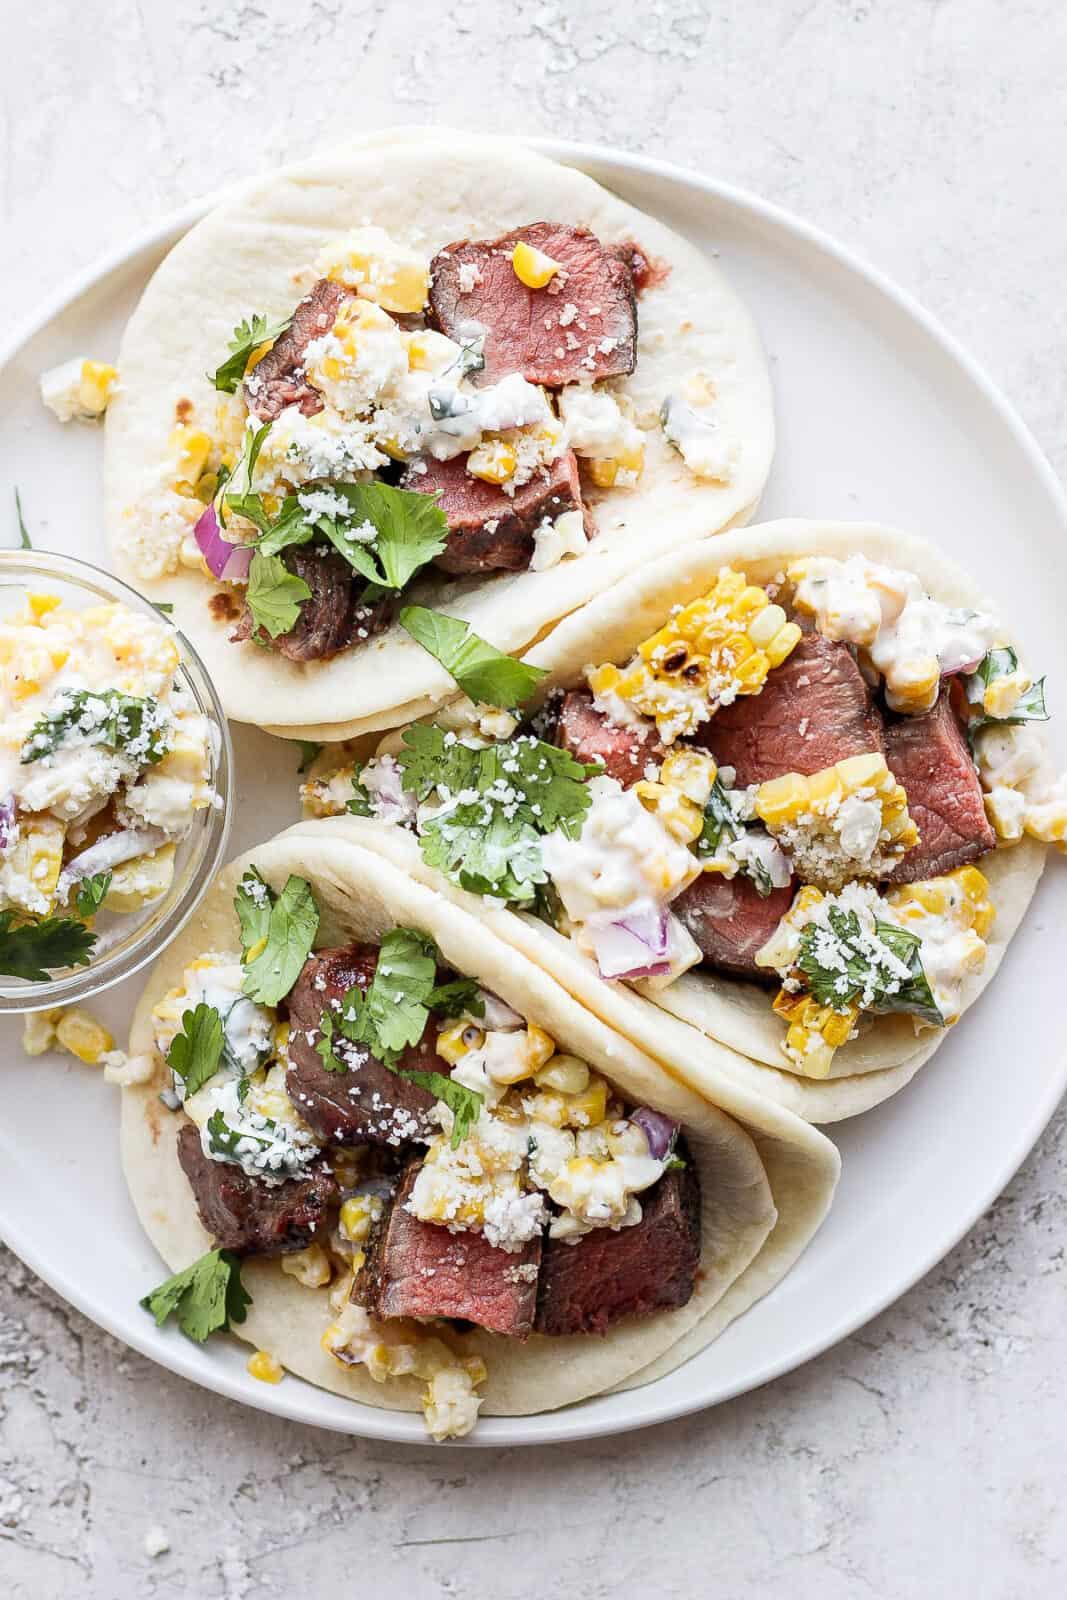 Three steak tacos on a plate.